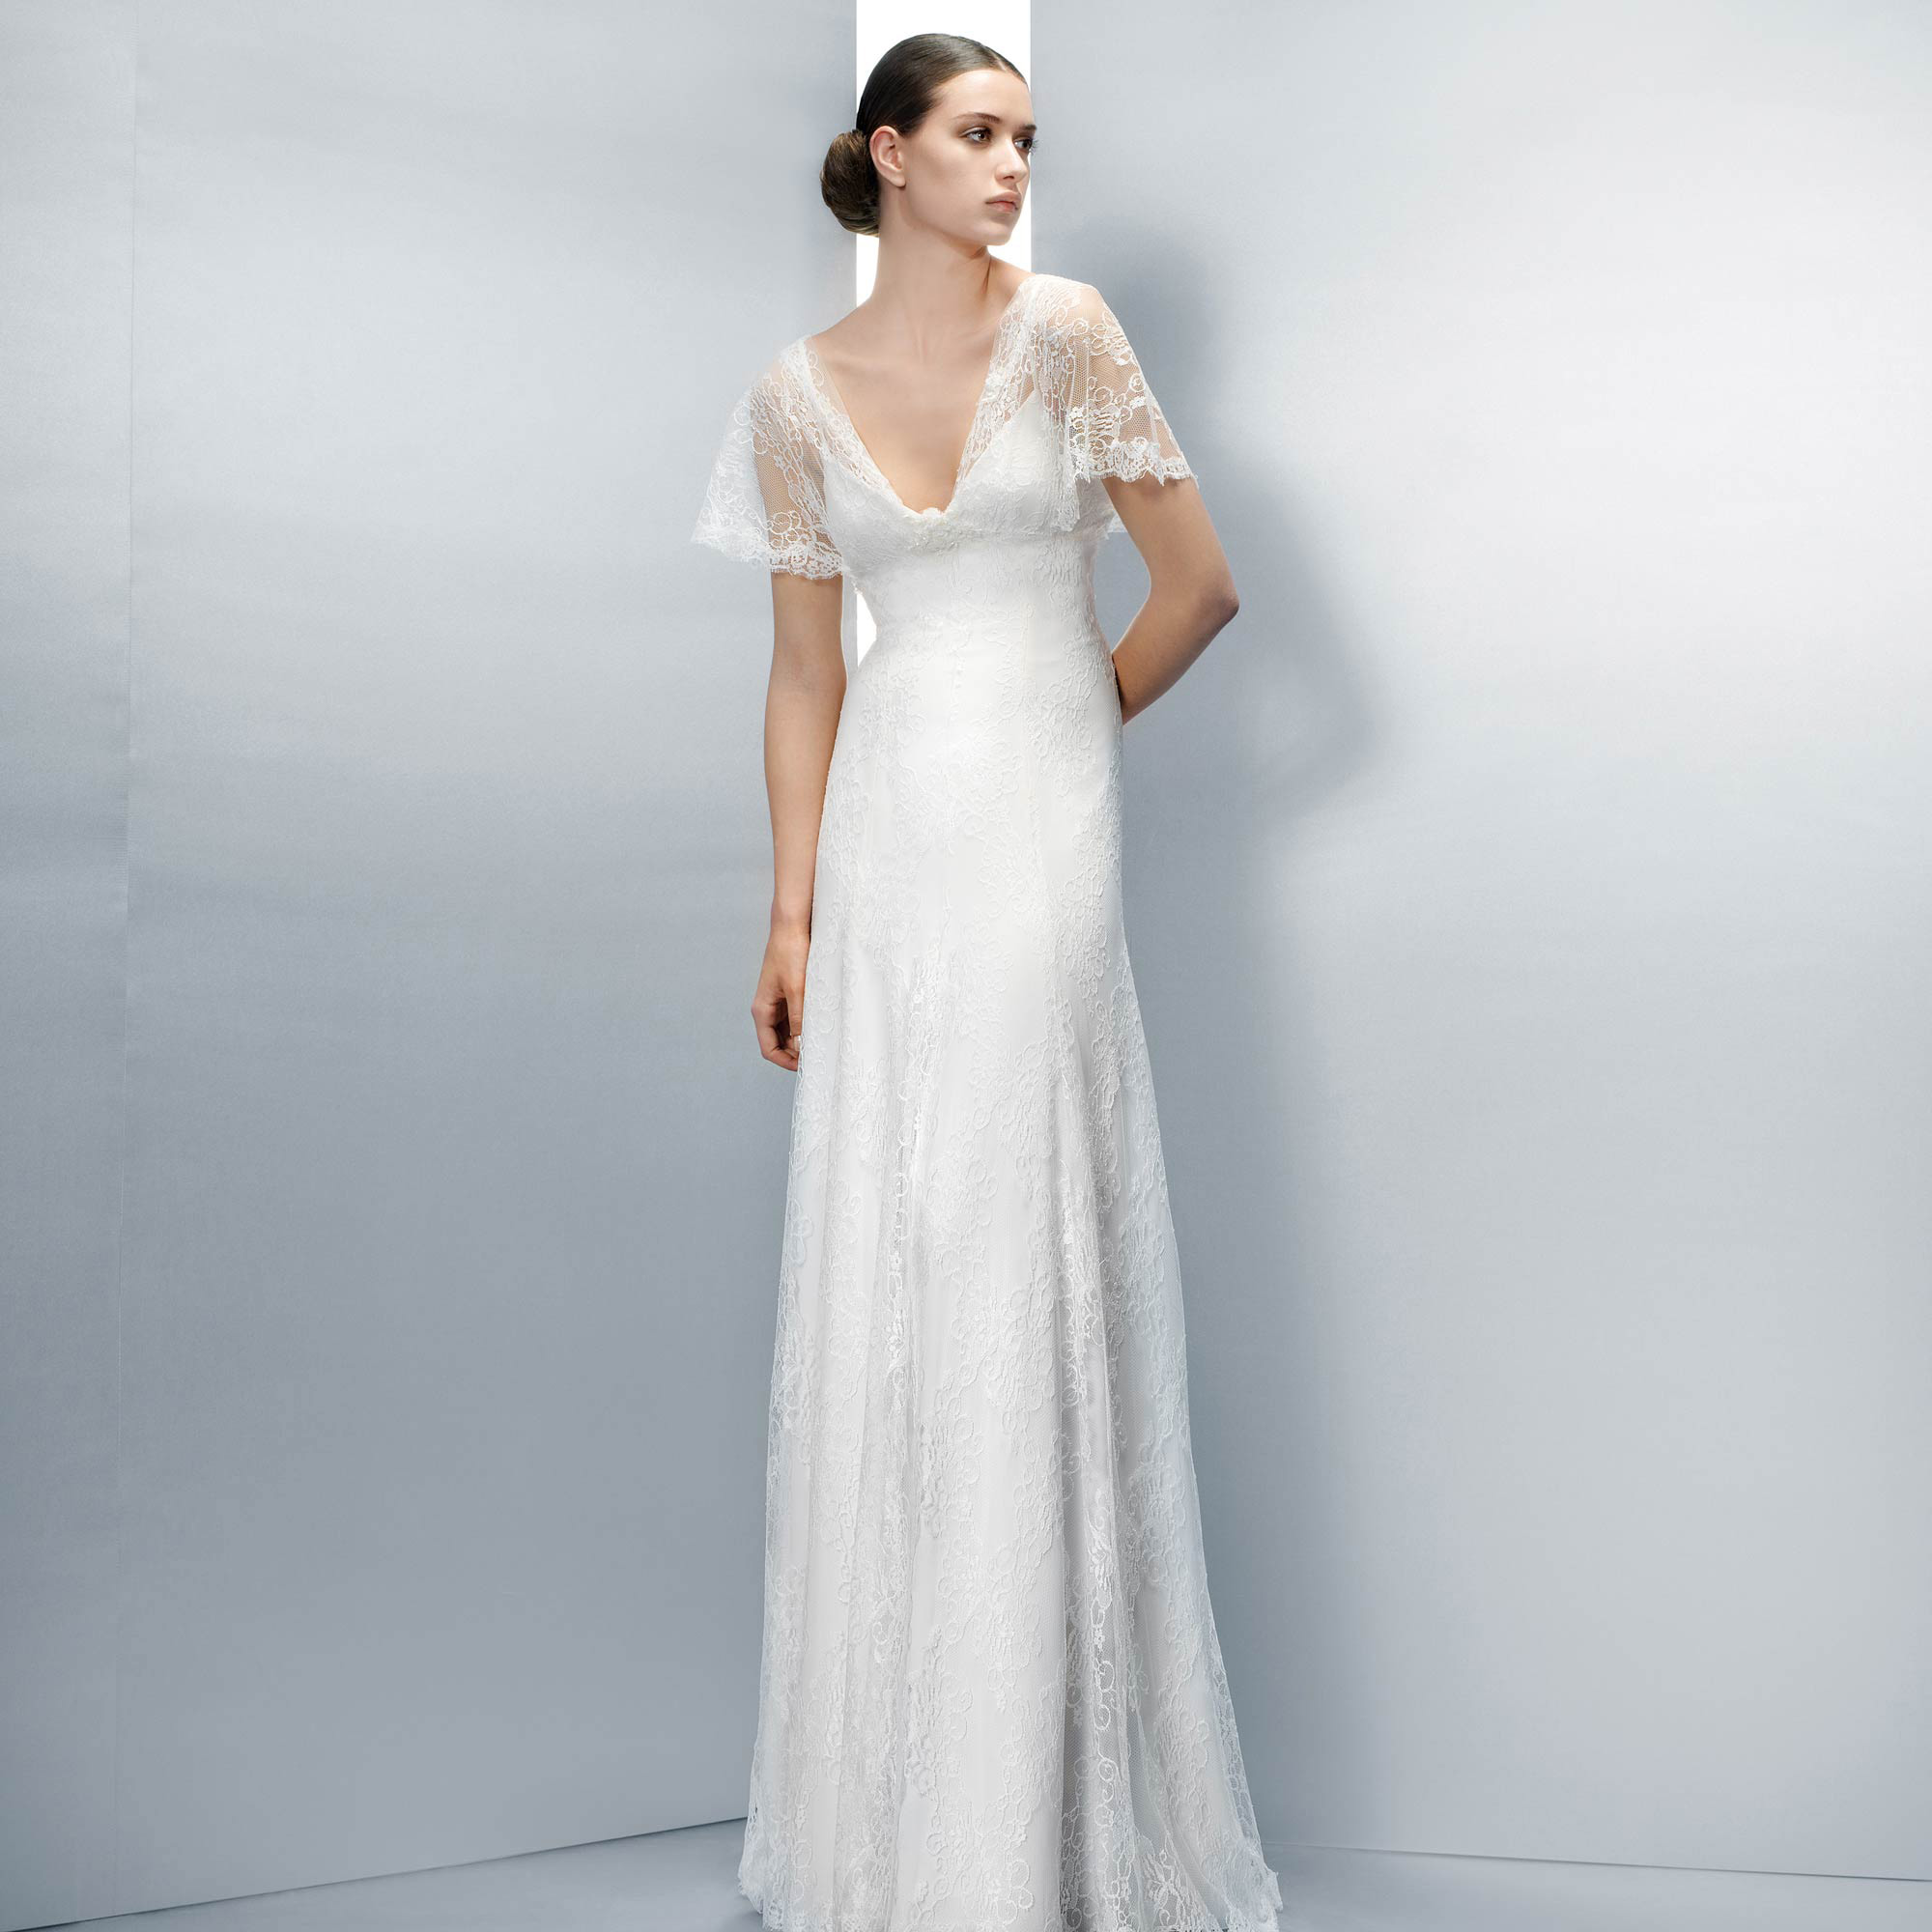 Jesus Peiro 2012 Spring Summer Bridal Collection | The FashionBrides